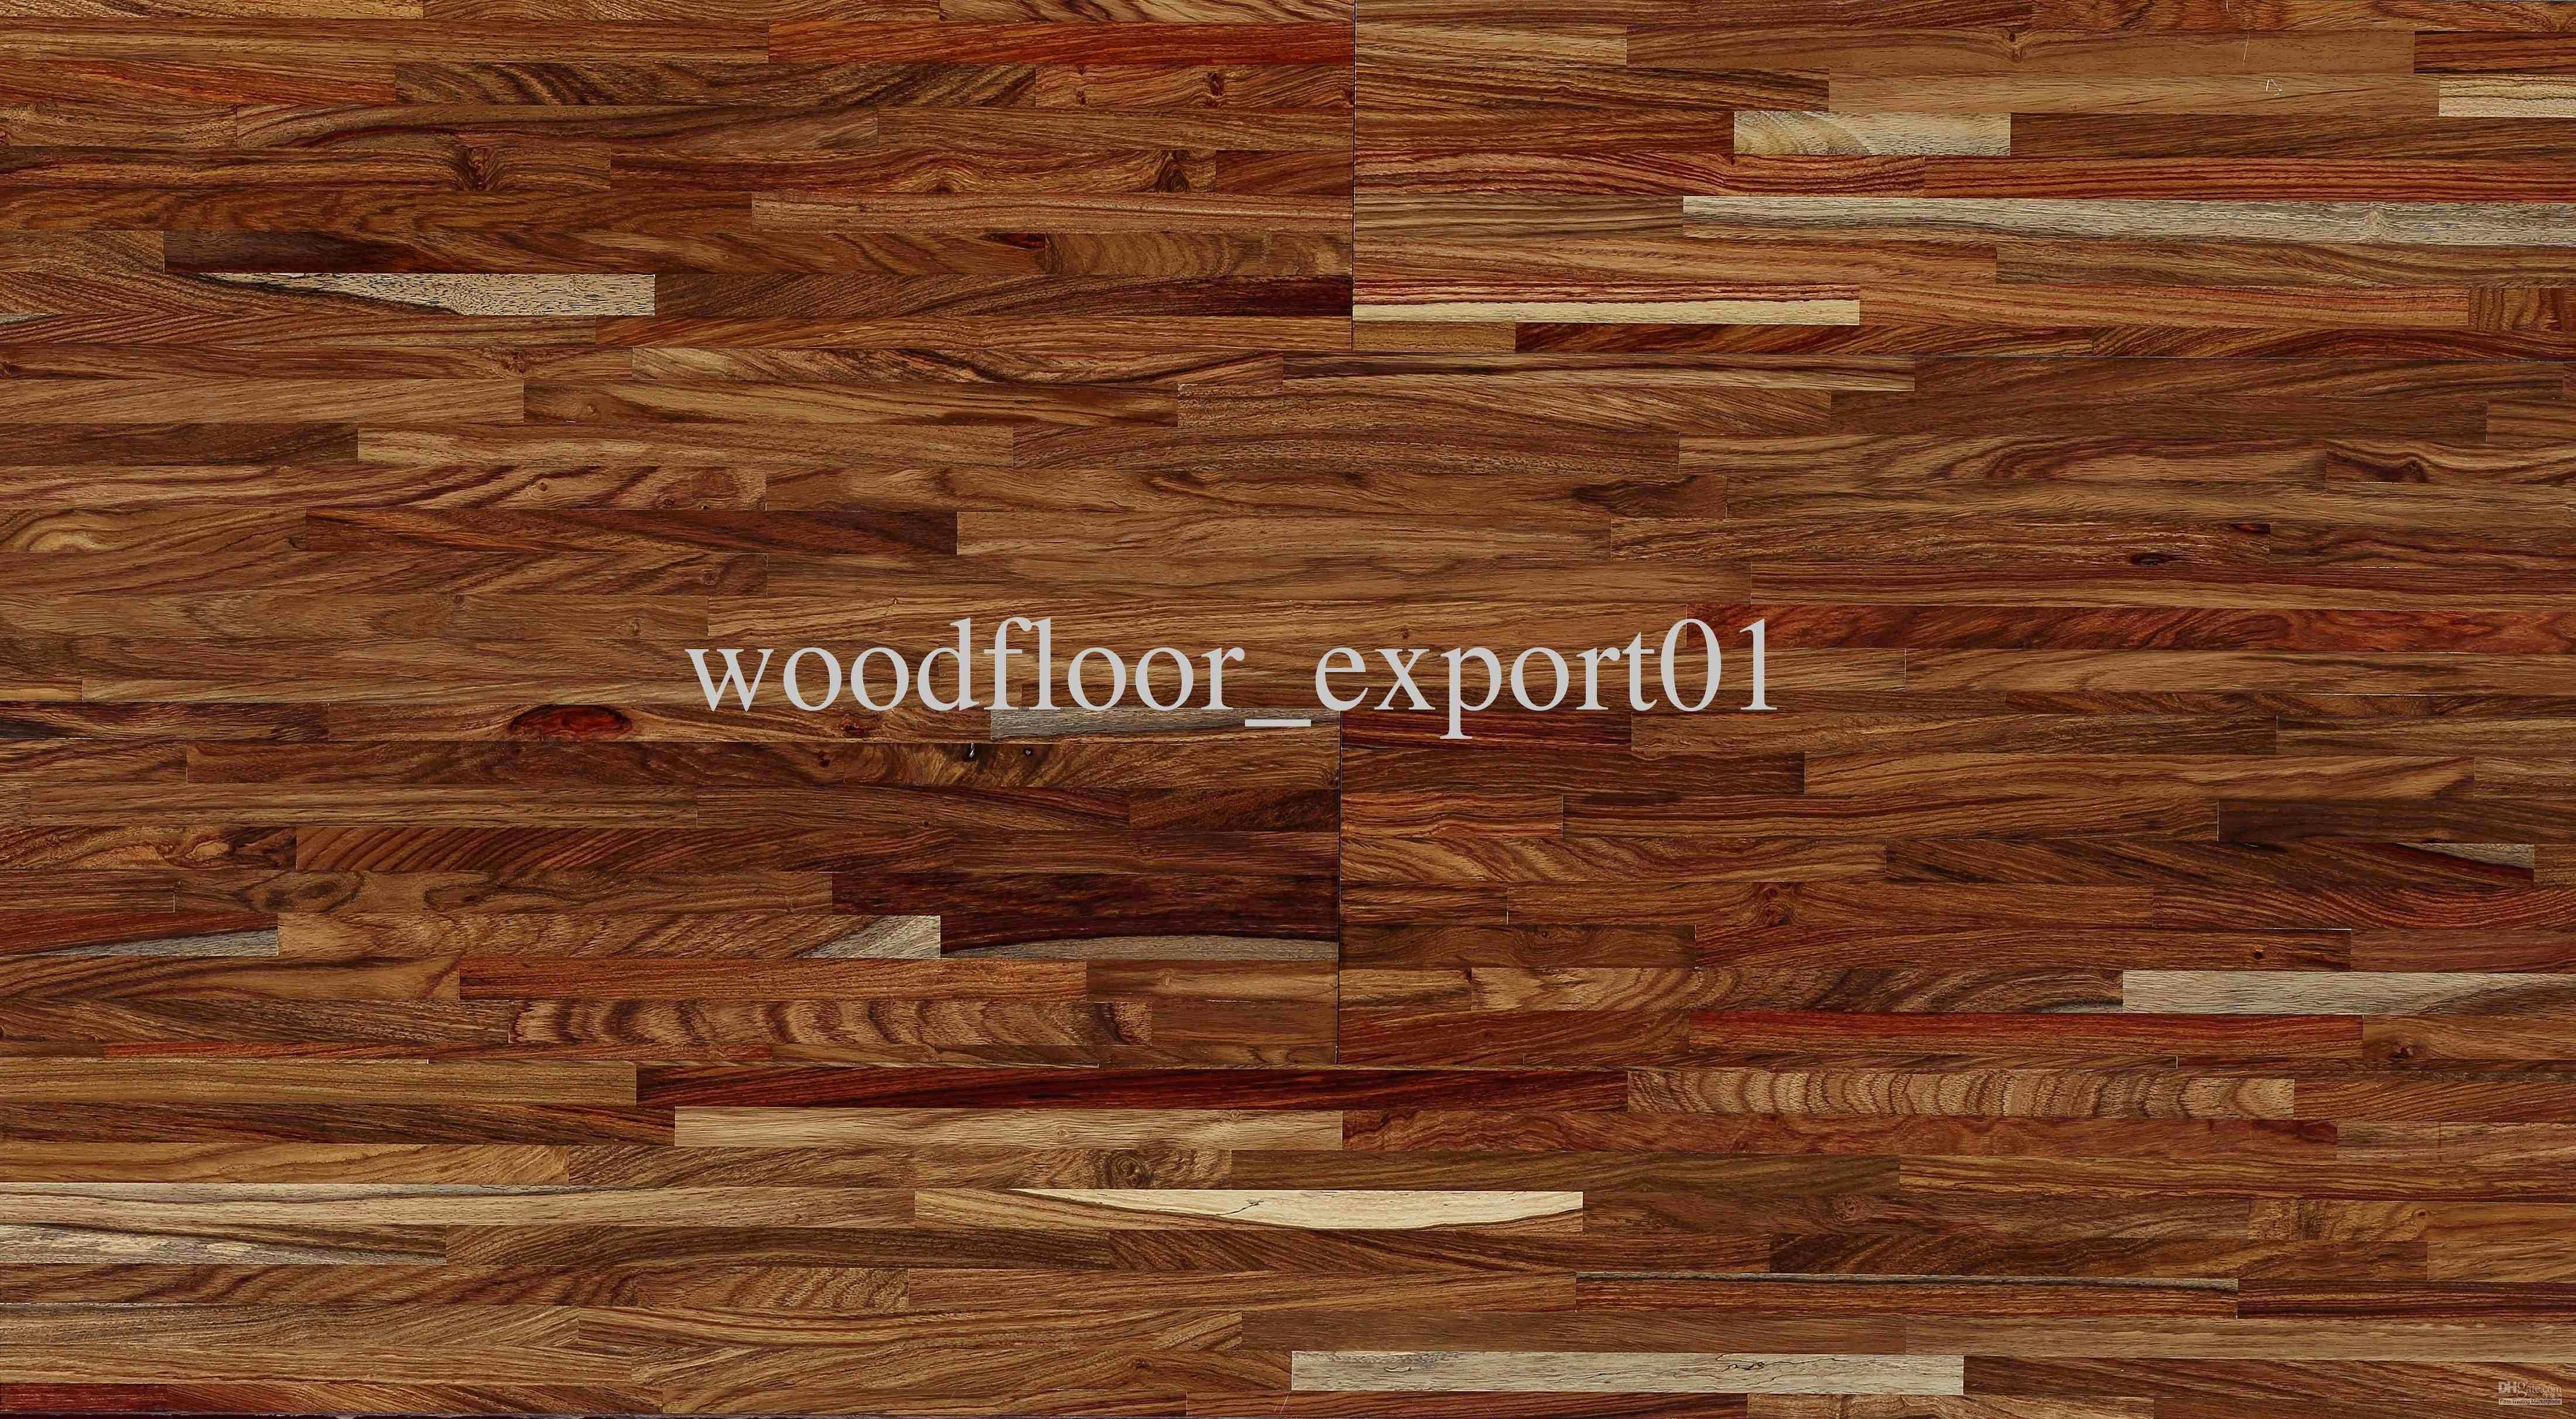 oak or maple hardwood floors which is better of 17 best of install hardwood floor image dizpos com for install hardwood floor best of 50 unique hardwood floor installers near me graphics 50 s images